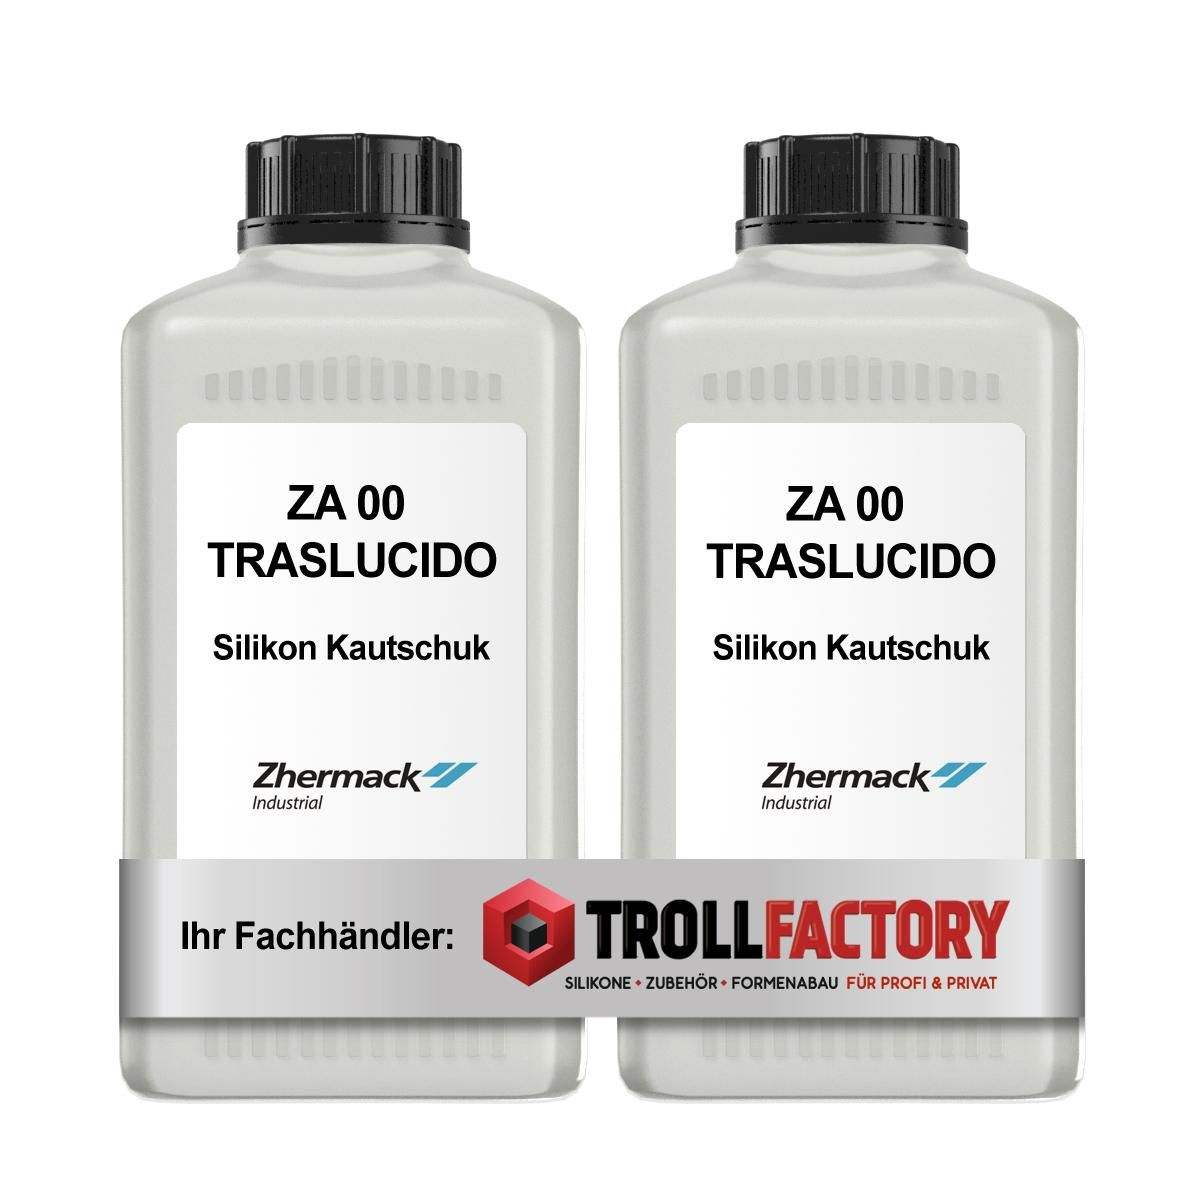 Zhermack Silikon ZA 00 Translucido 1+1kg